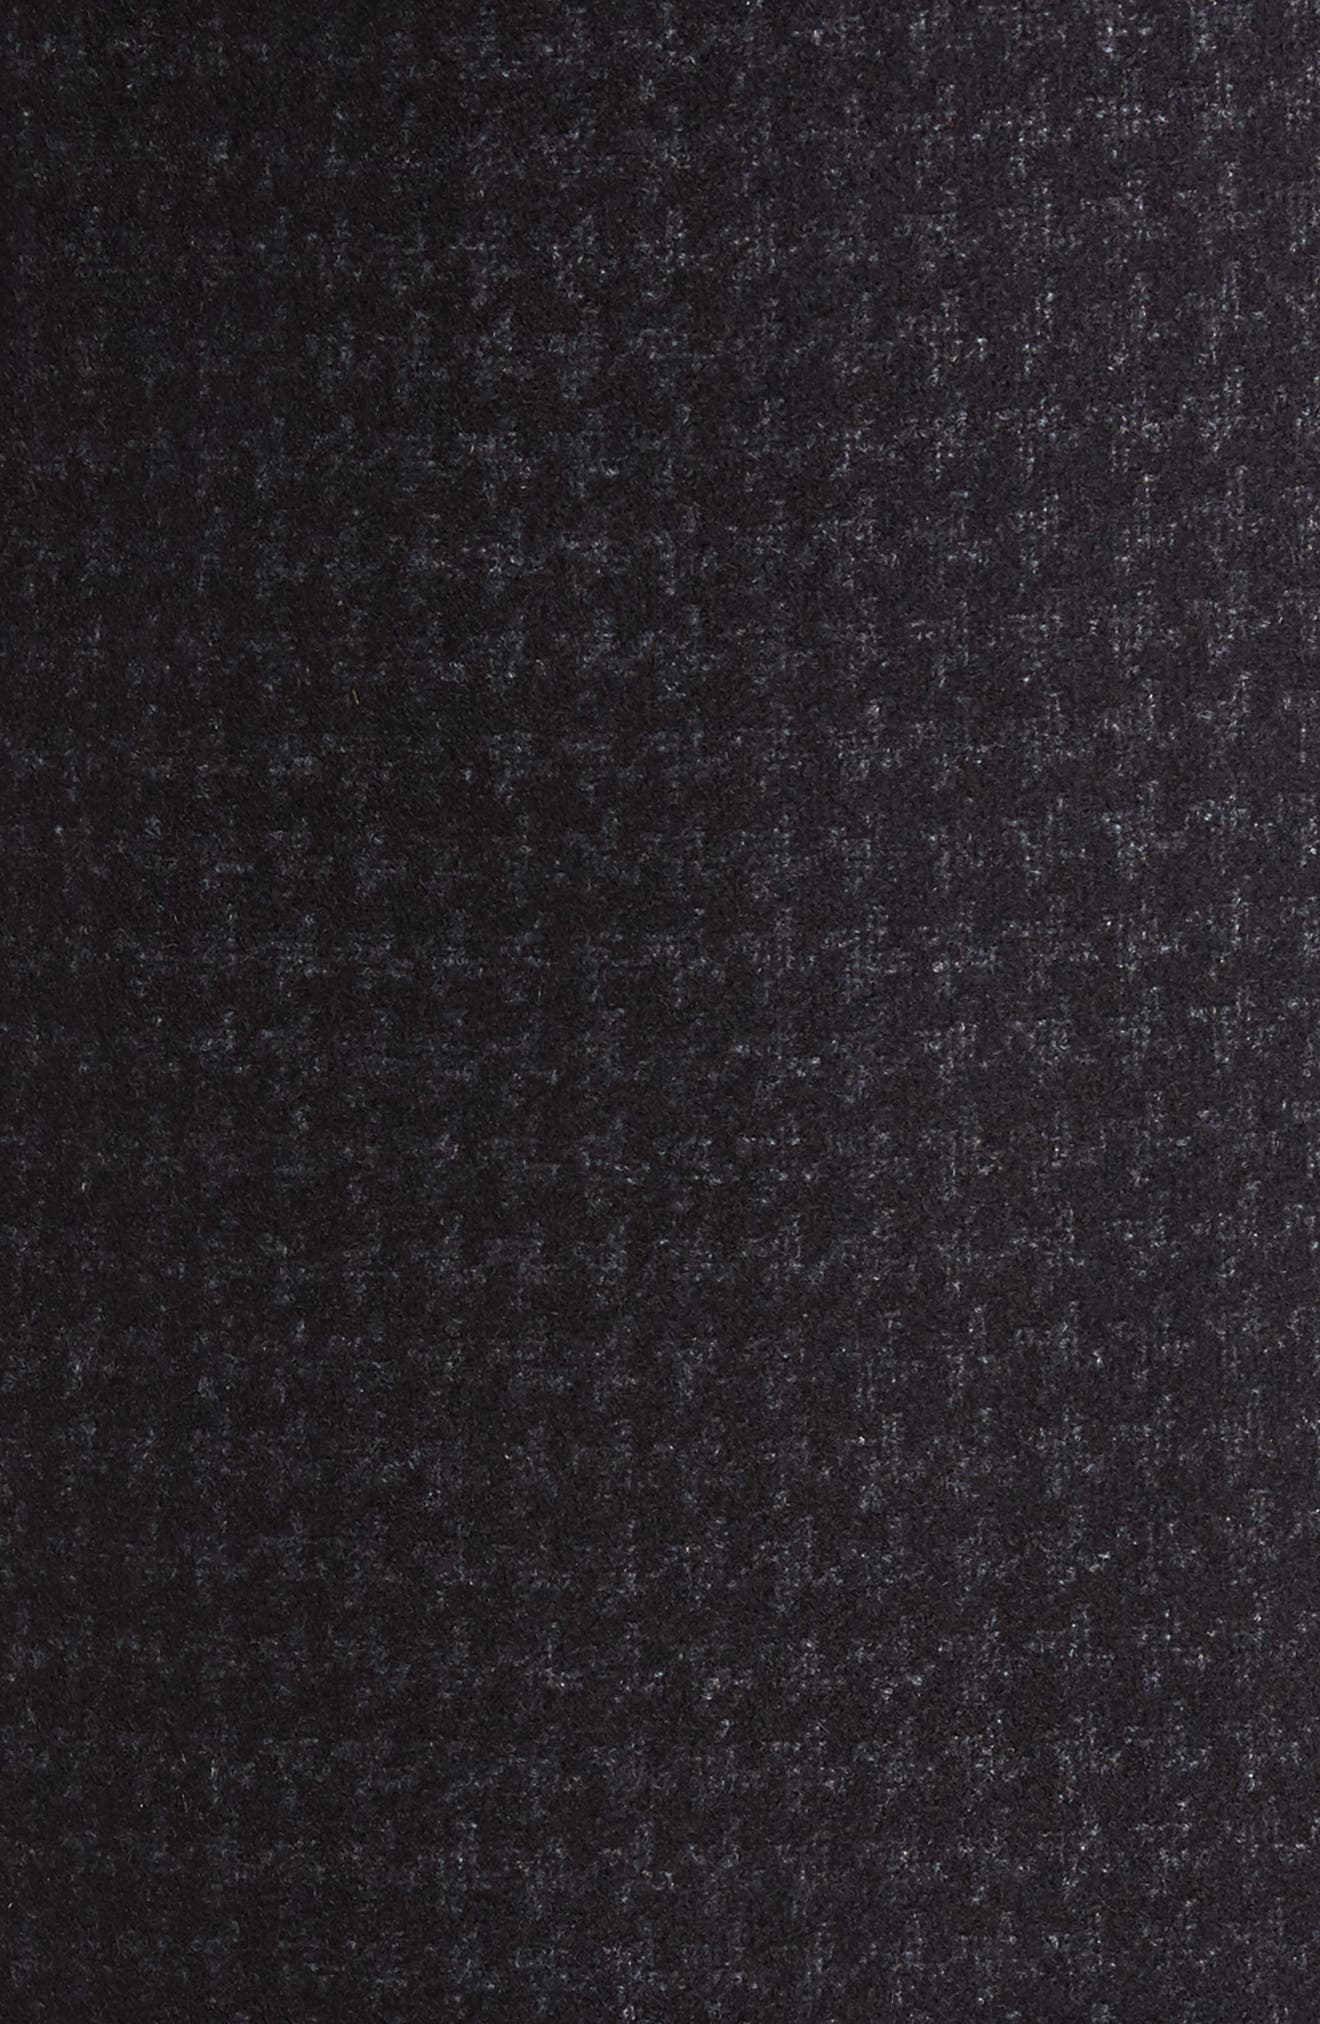 Jackson Houndstooth Wool Blend Overcoat,                             Alternate thumbnail 6, color,                             410